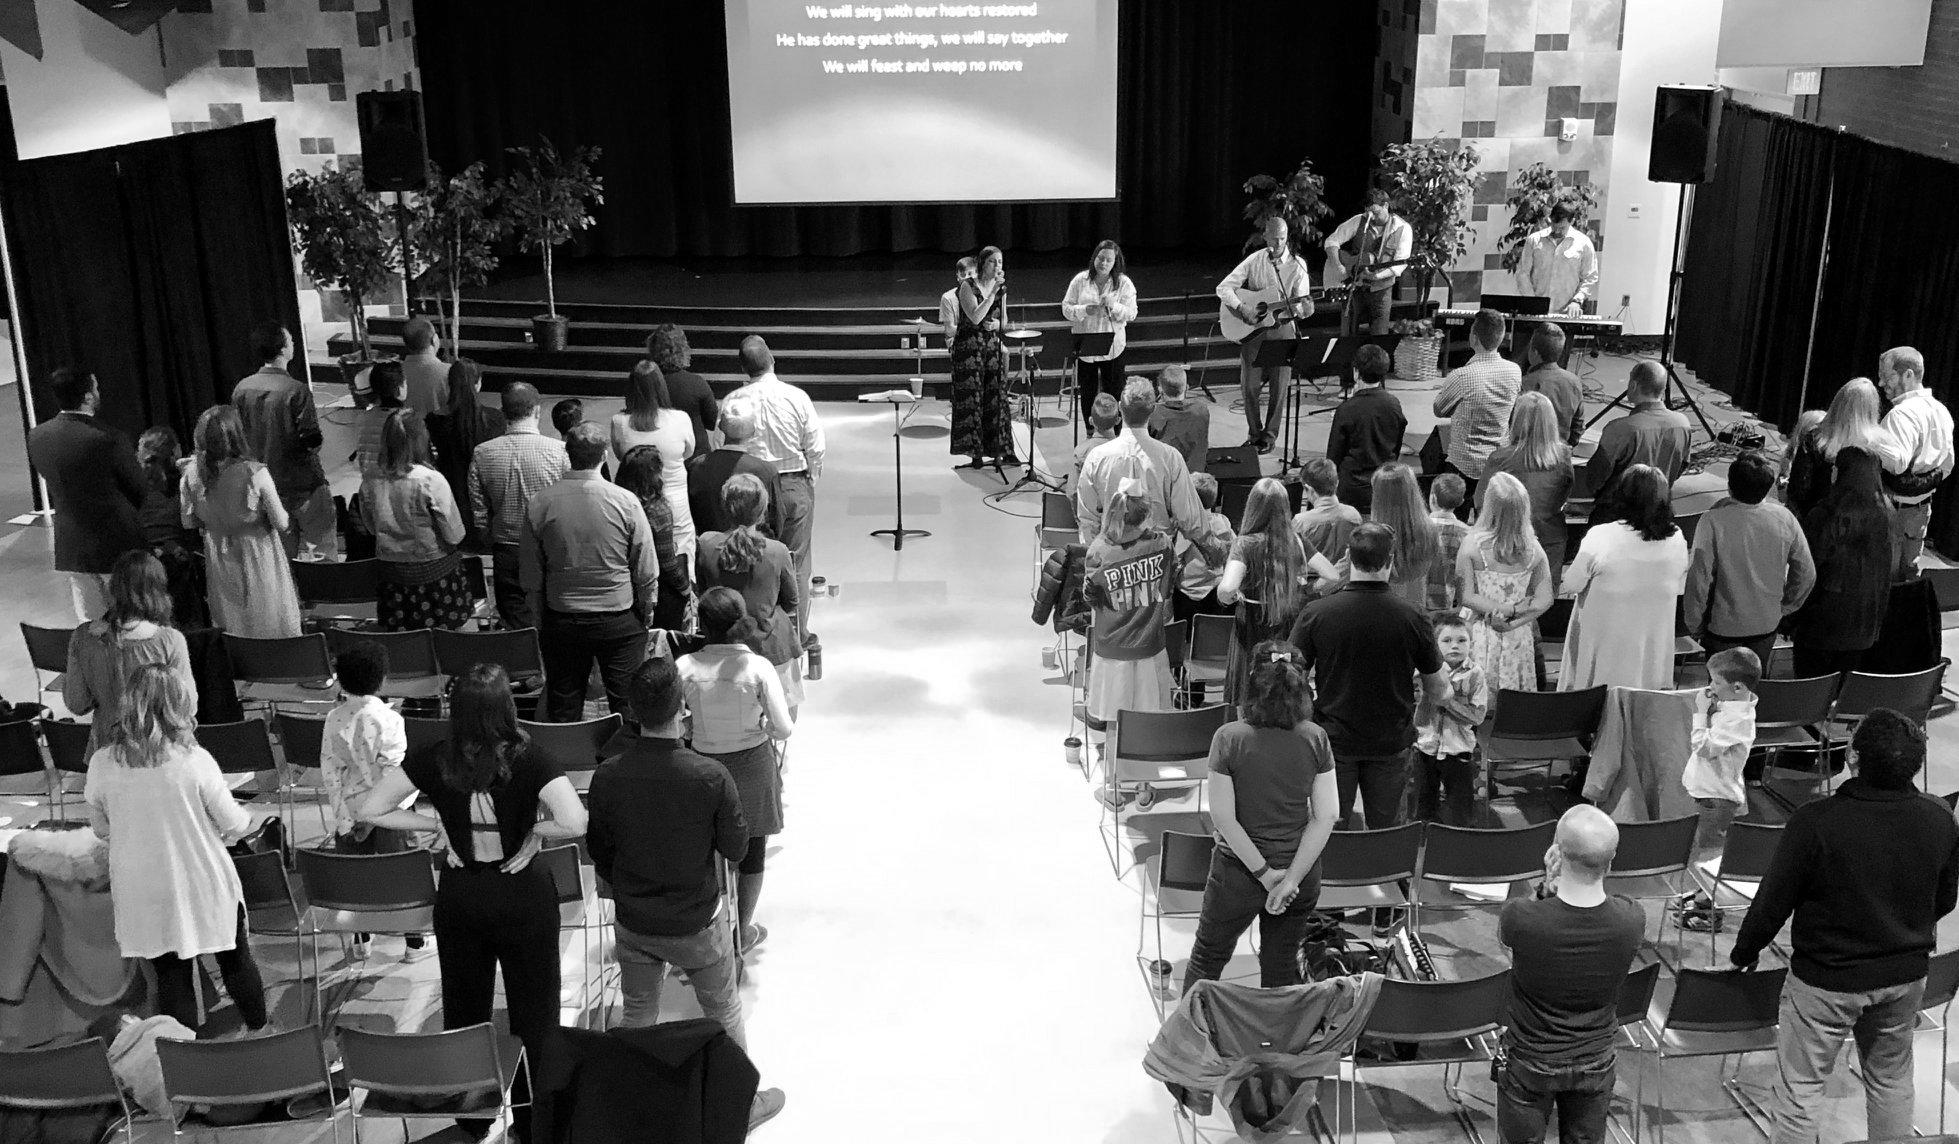 Sundays, 10 am - Broomfield Heights Middle School1555 Daphne St, Broomfield, CO 80020